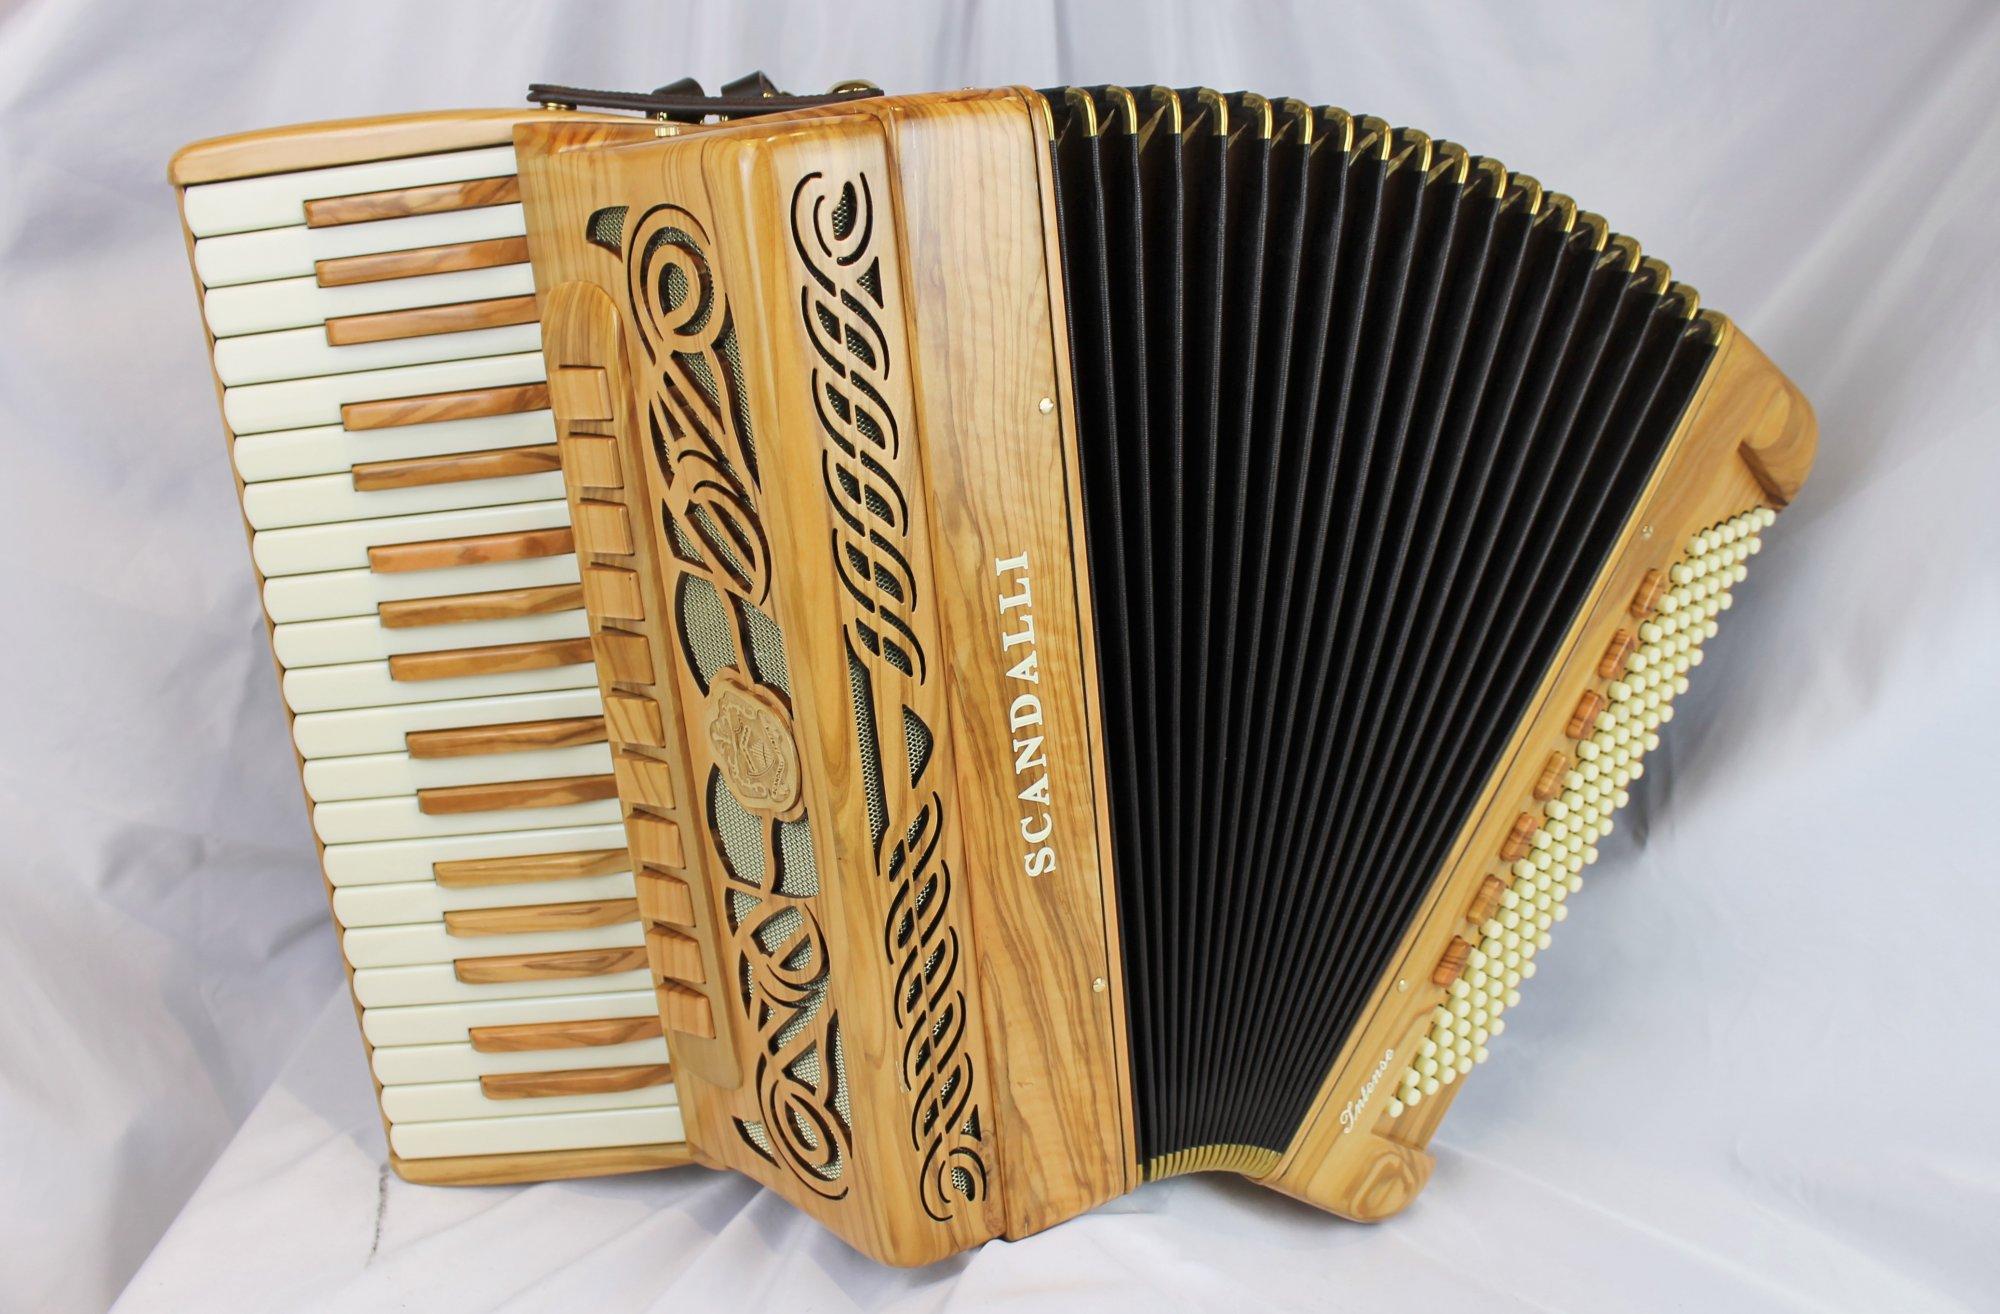 NEW Olive Wood Scandalli Intense 37 Piano Accordion LMMH 37 120